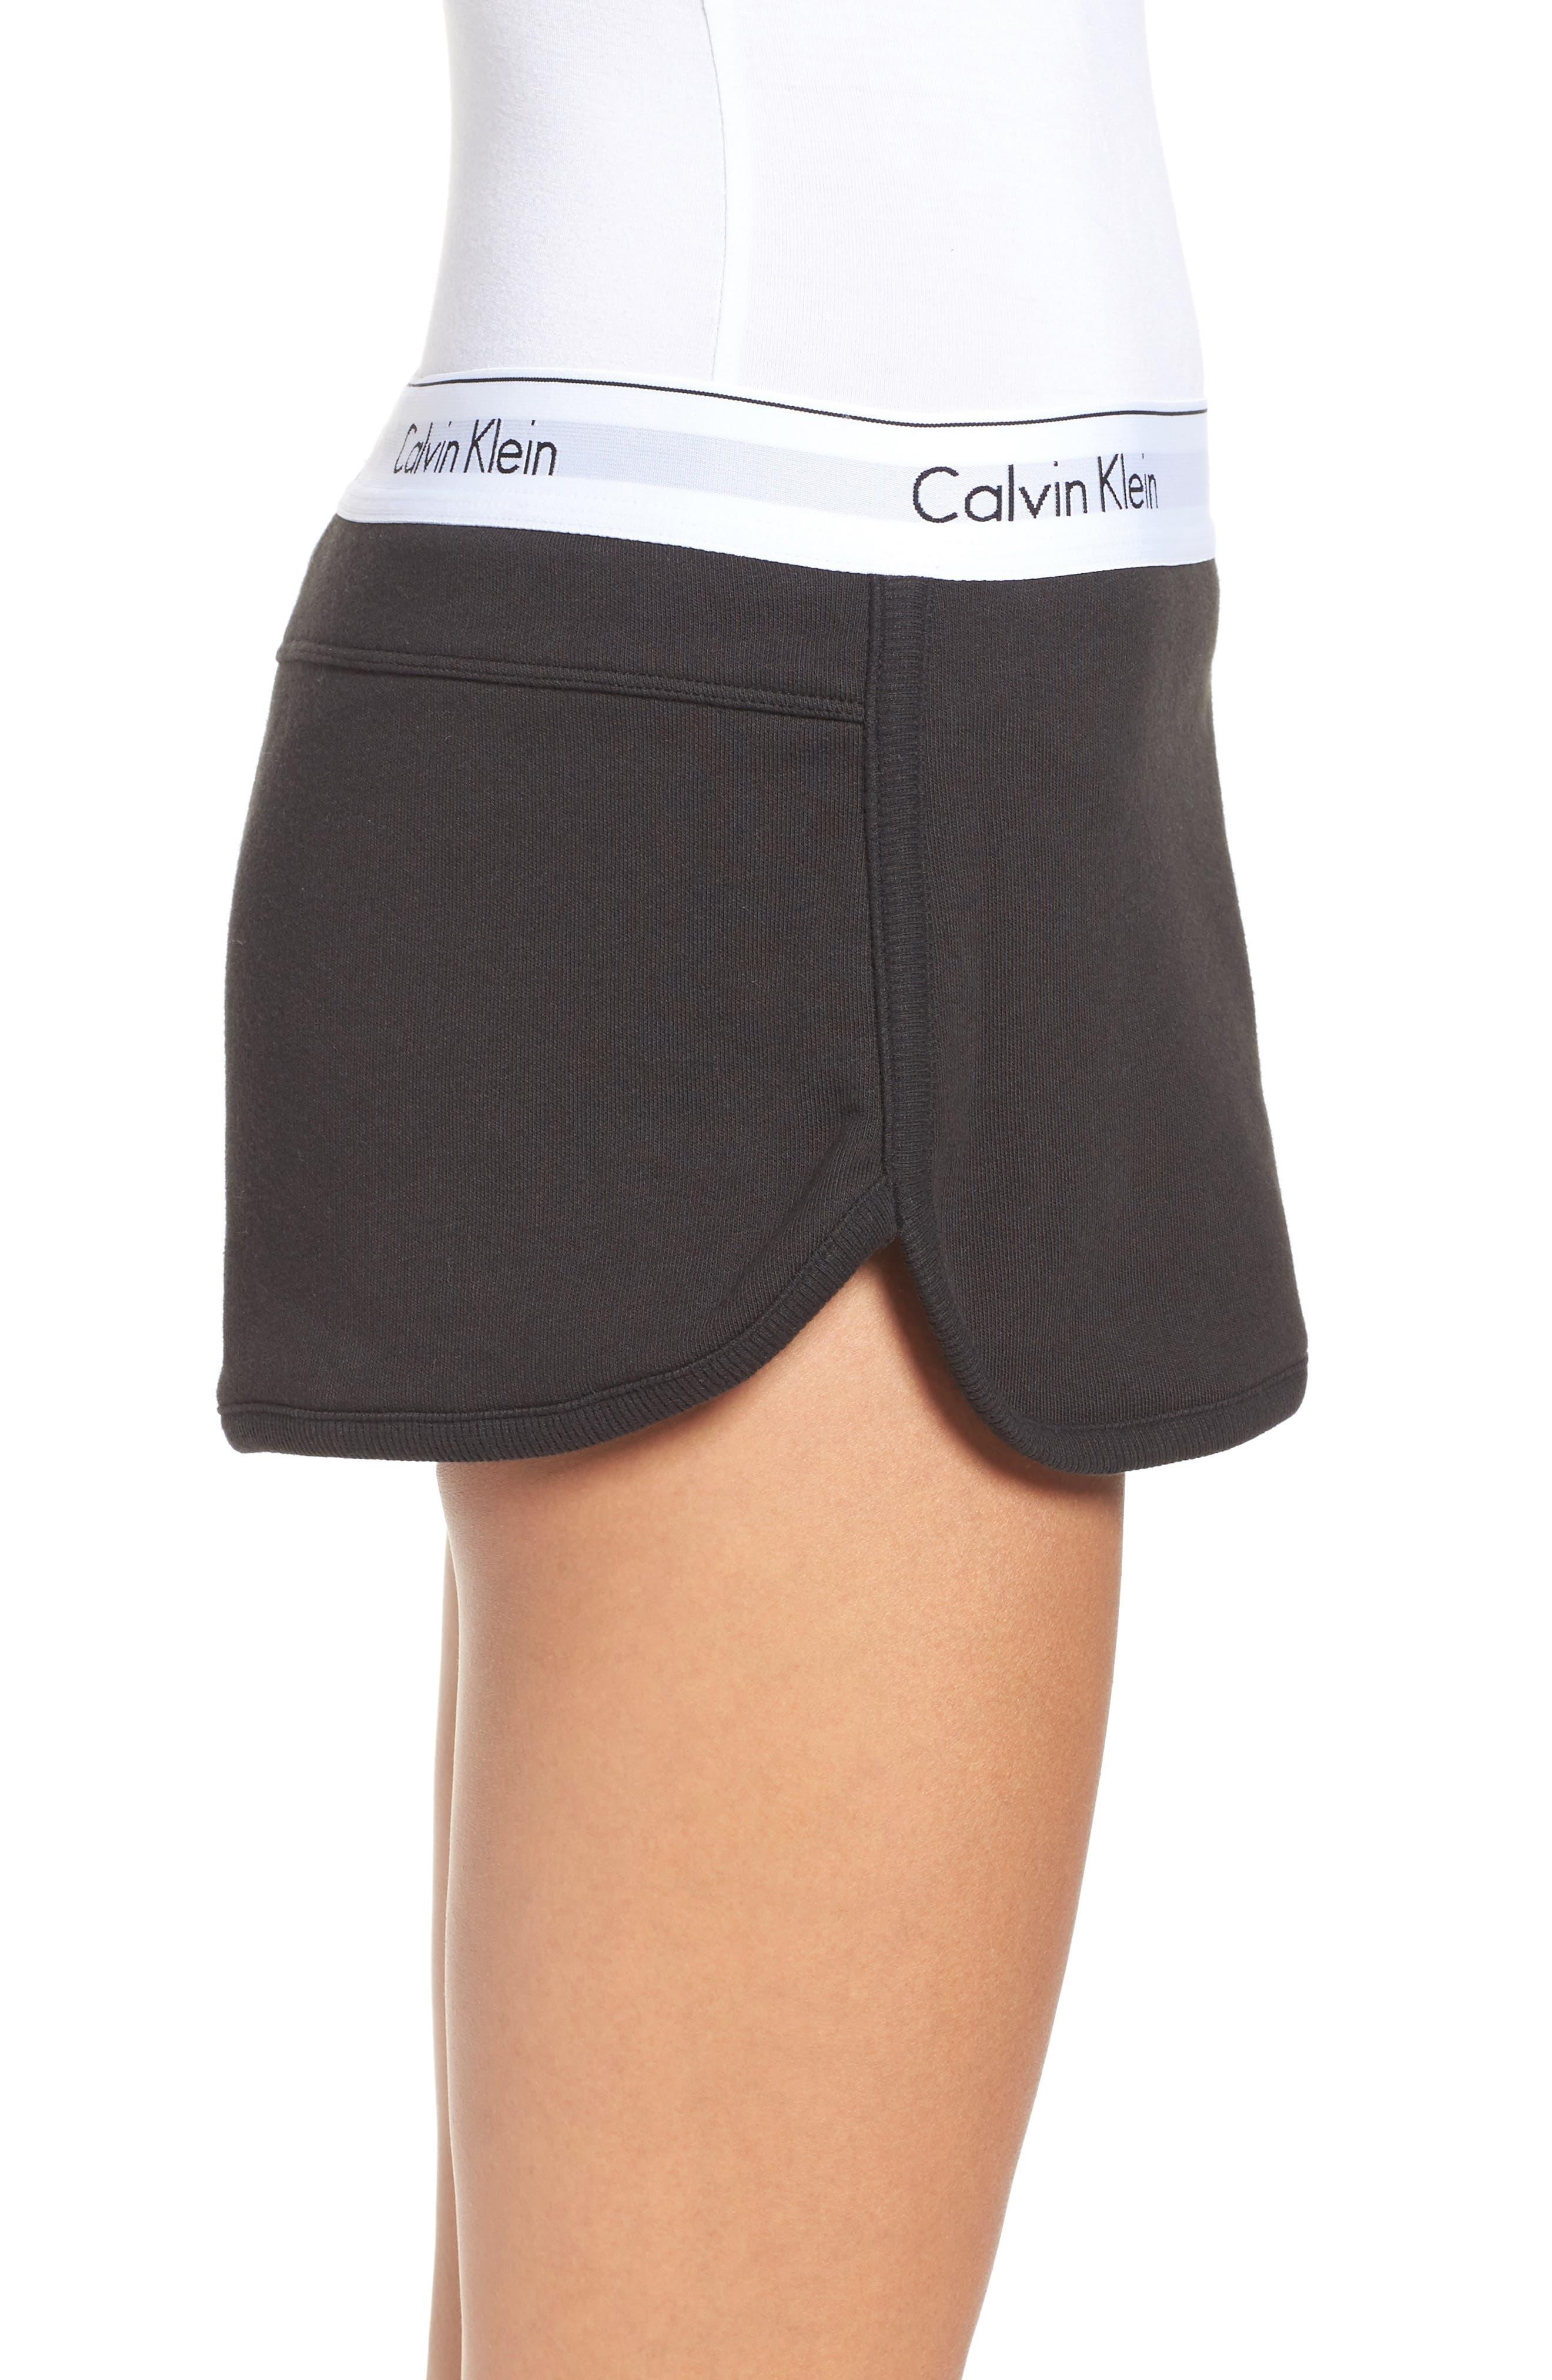 Lounge Shorts,                             Alternate thumbnail 3, color,                             001